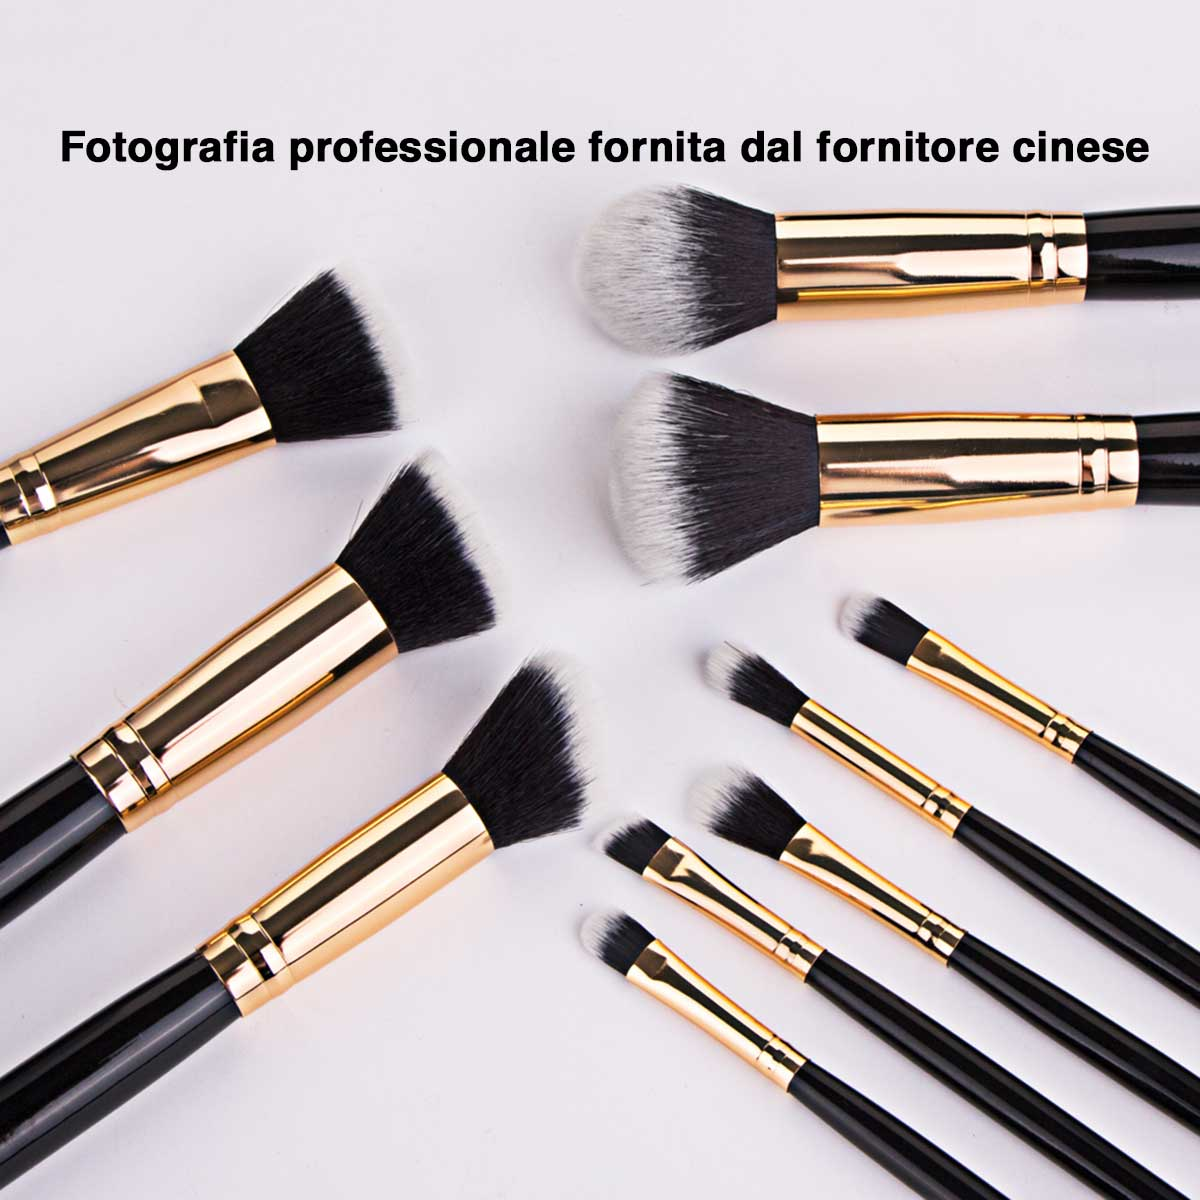 Federico_Balmas_Fotografia_Blog_Fotografo_eCommerce_Amazon_Torino_16_0